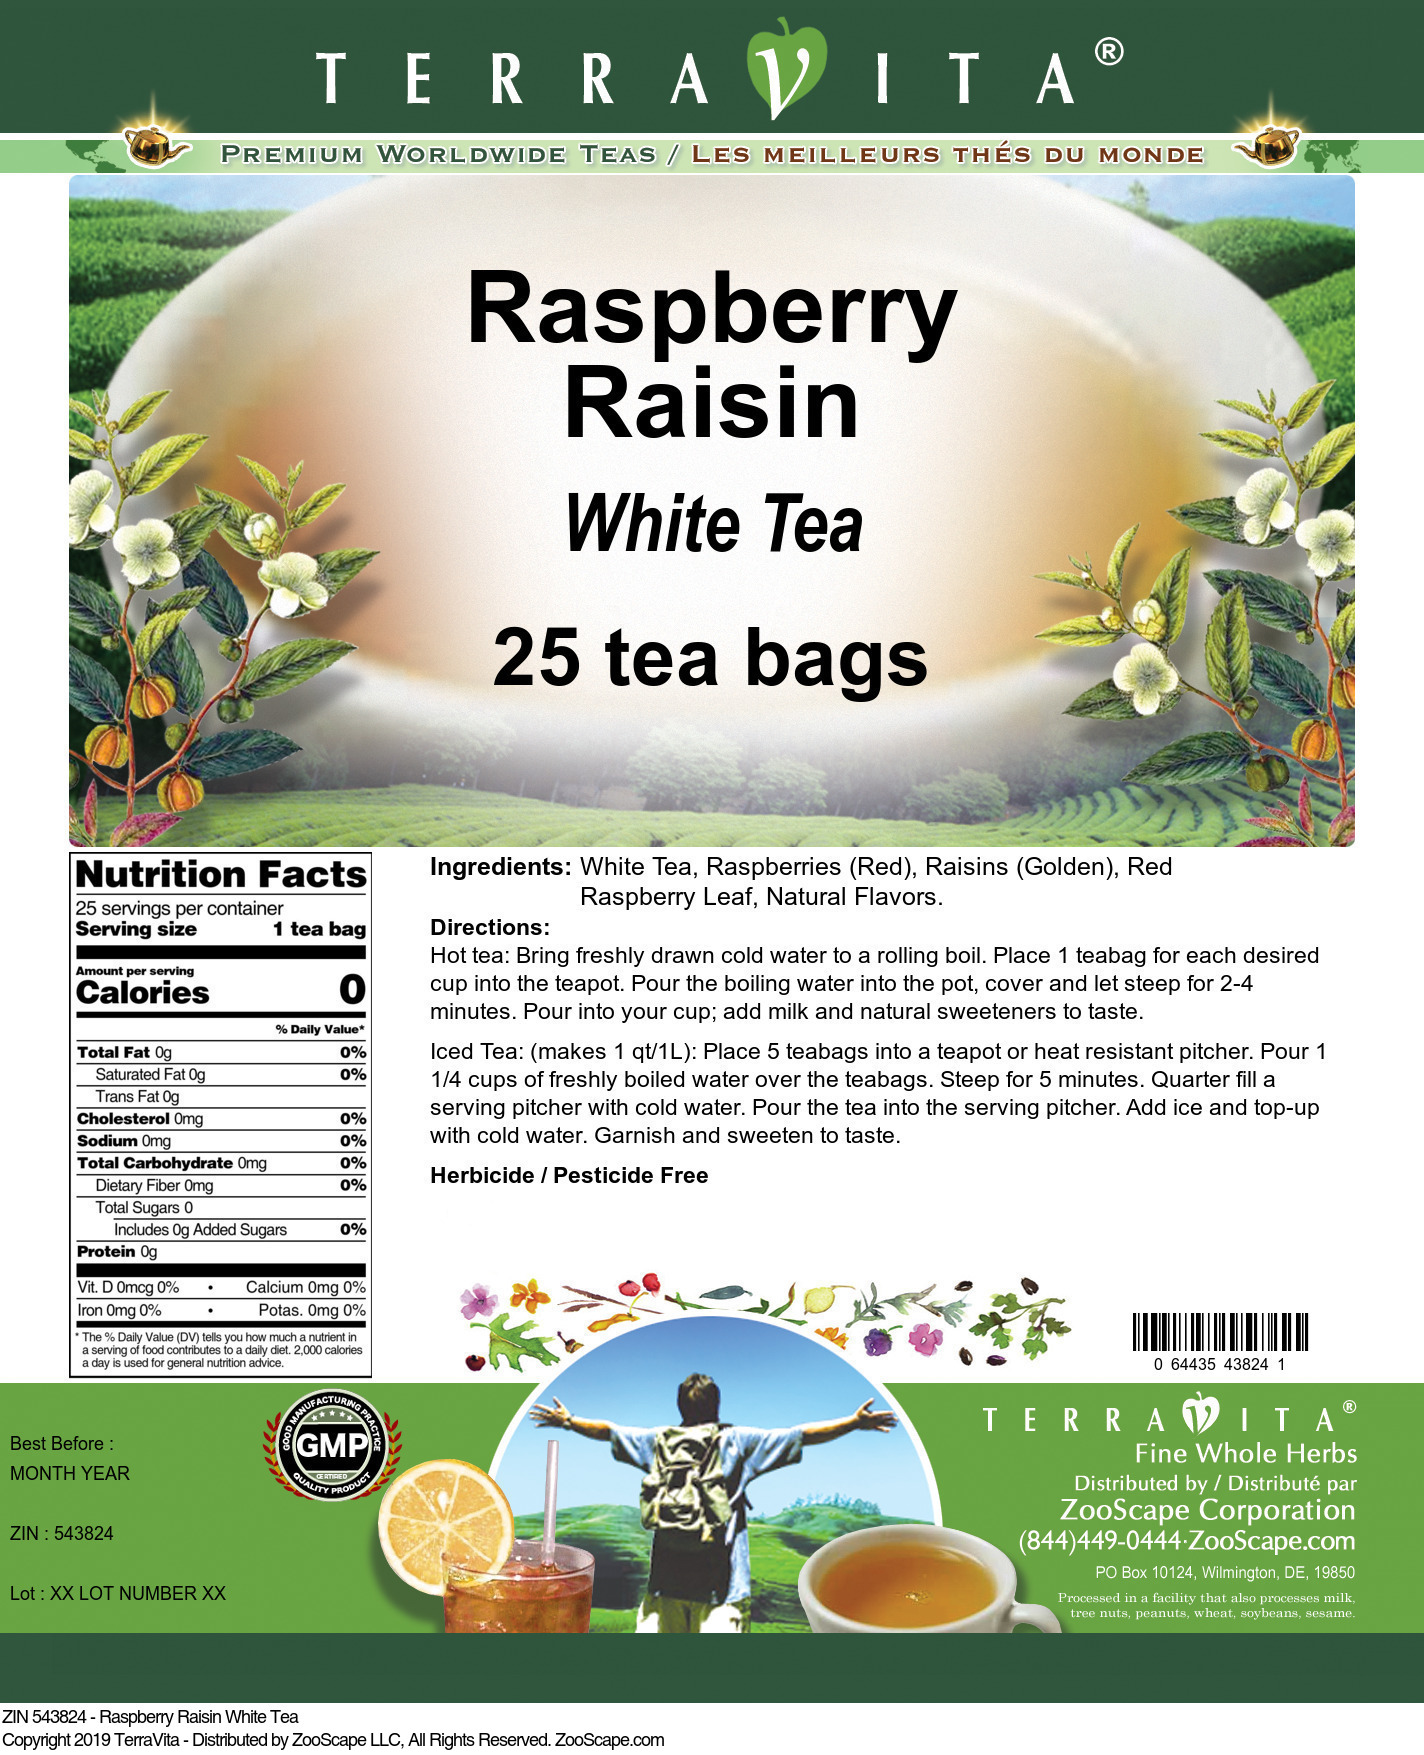 Raspberry Raisin White Tea